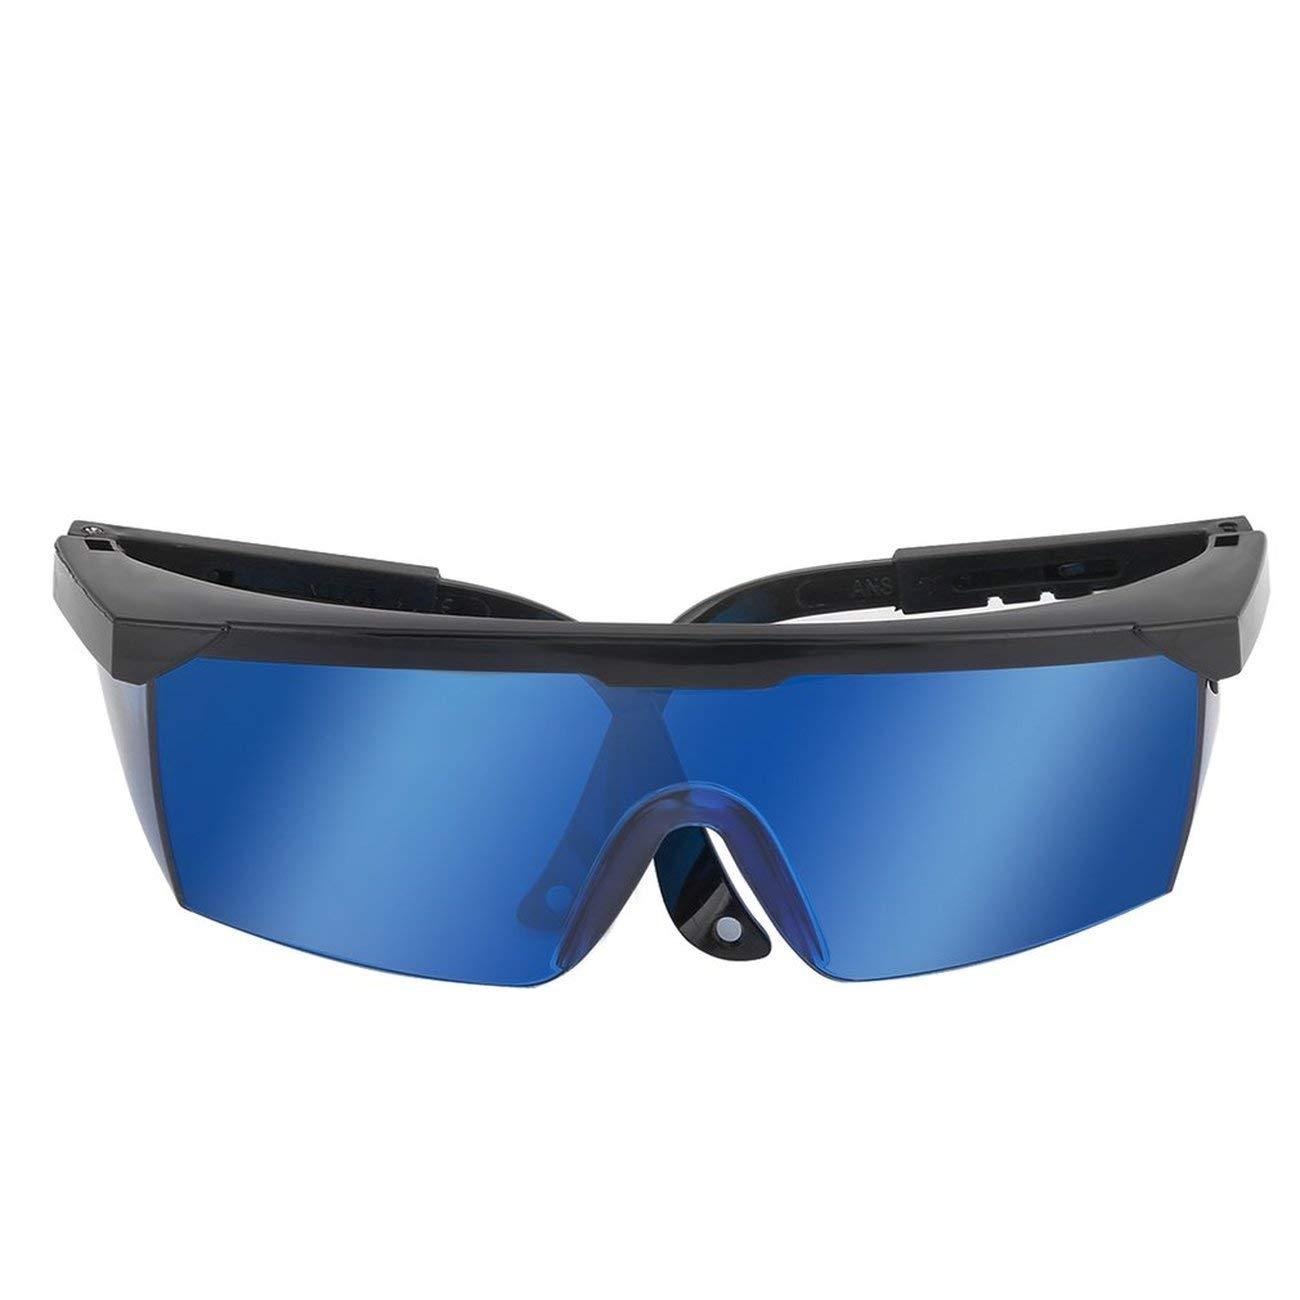 Elviray Gafas de Seguridad l/áser para Violeta//Azul 200-450//800-2000nm Absorci/ón Gafas Protectoras Redondas Gafas de protecci/ón l/áser Gafas